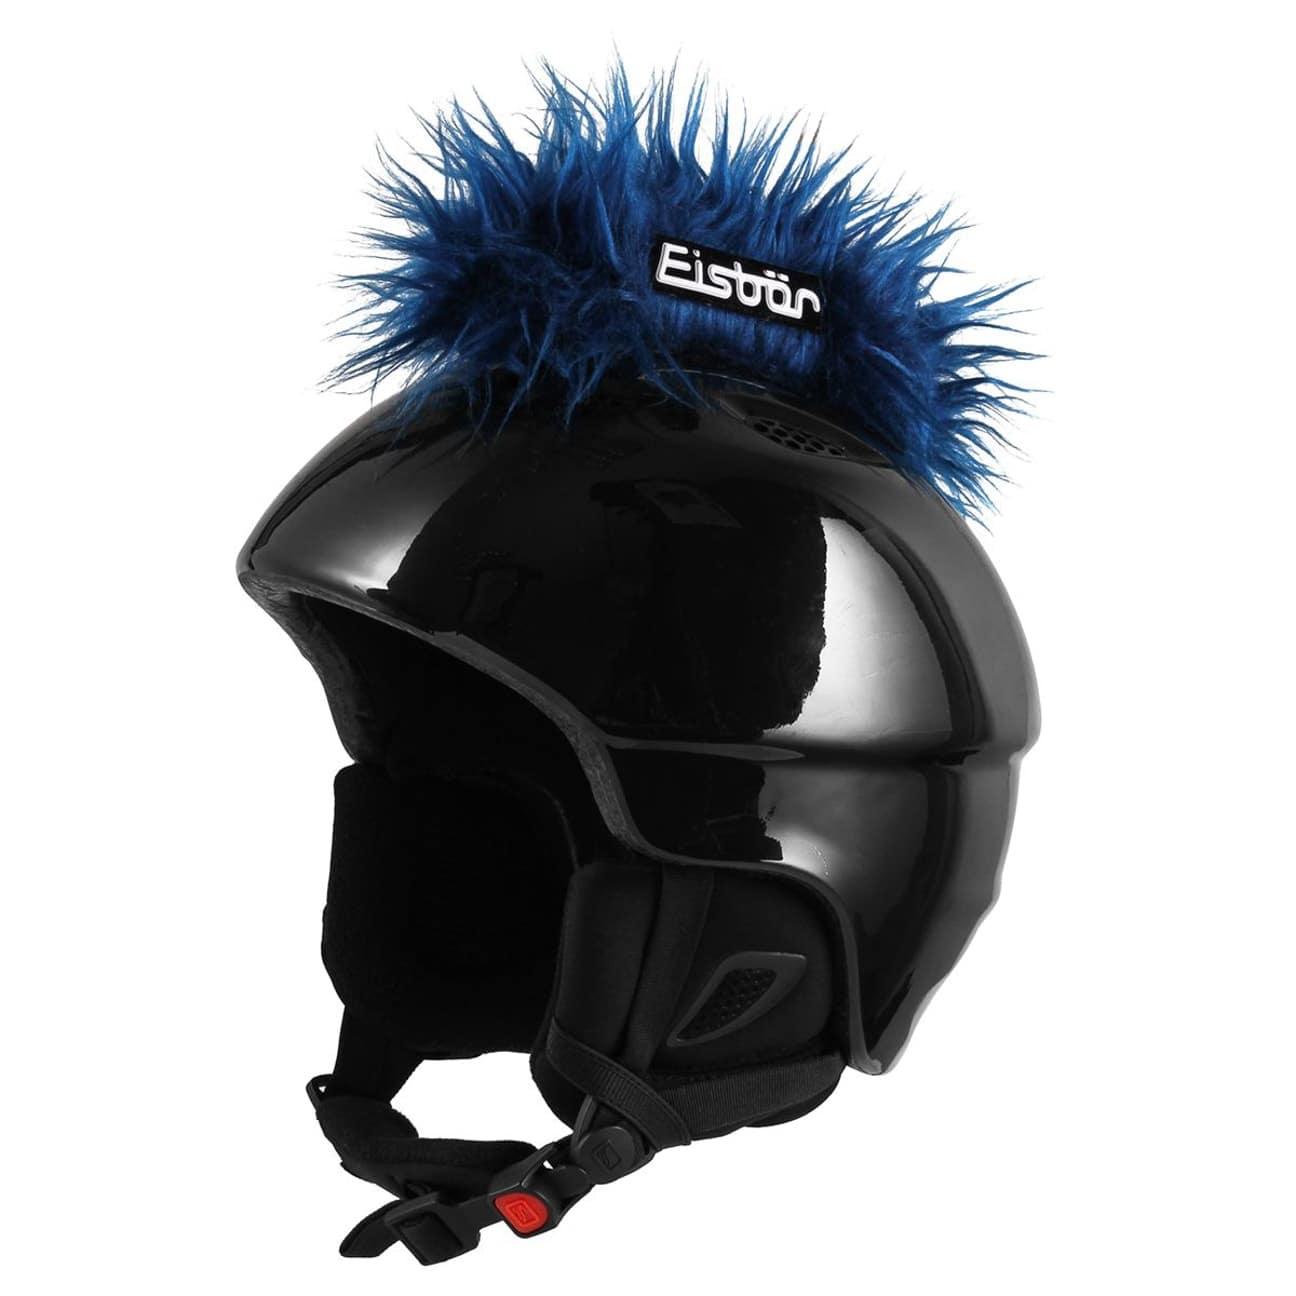 Iroquois helmet sticker